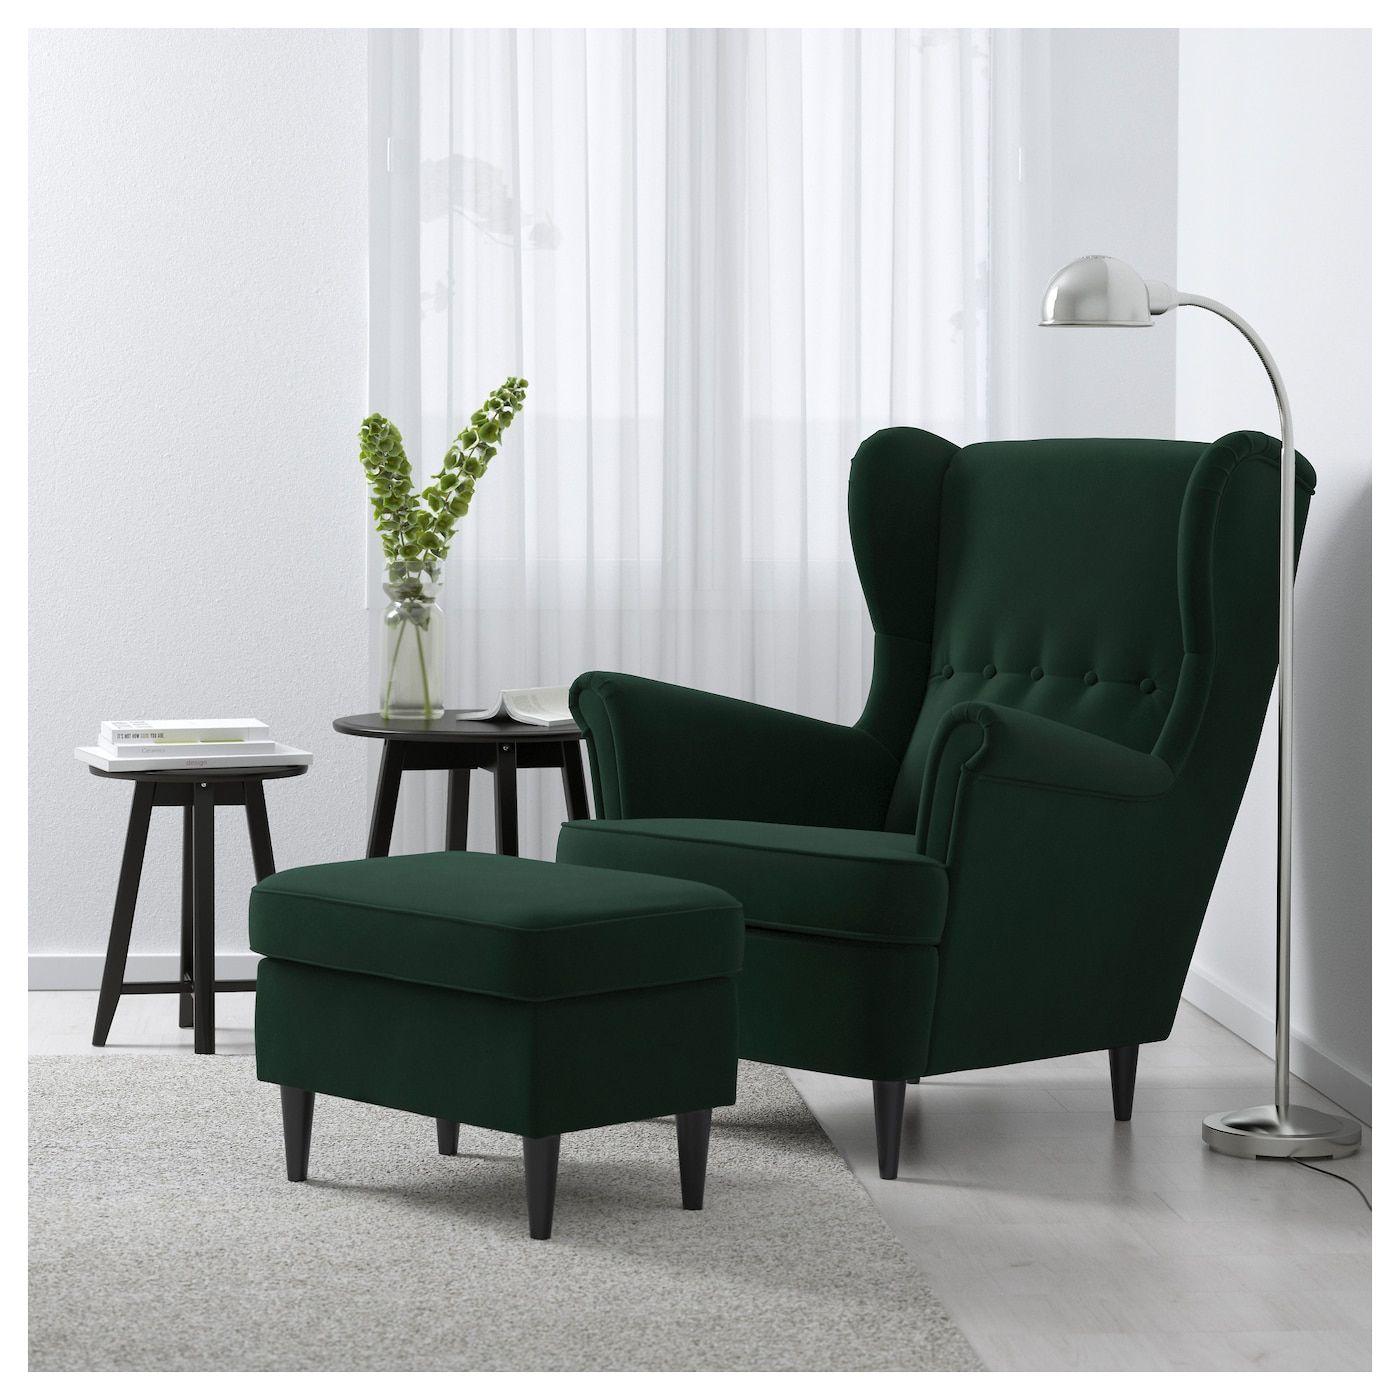 Strandmon Wing Chair Djuparp Dark Green Ikea Turquoise Living Room Decor Wing Chair Ikea Chair